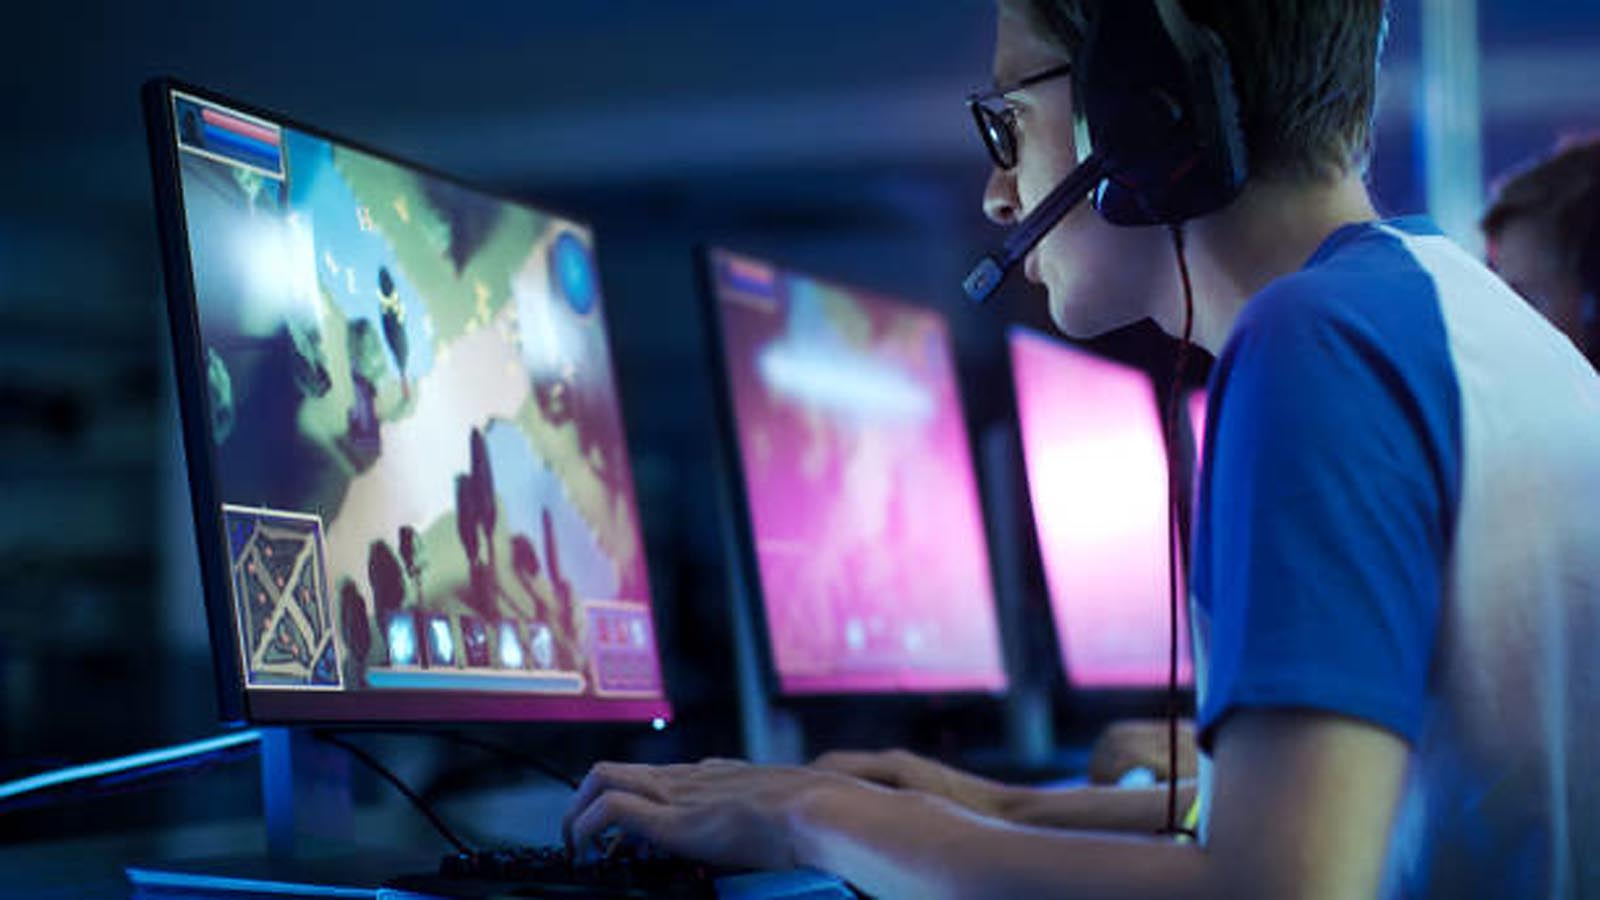 Mejores ordenadores para gamers